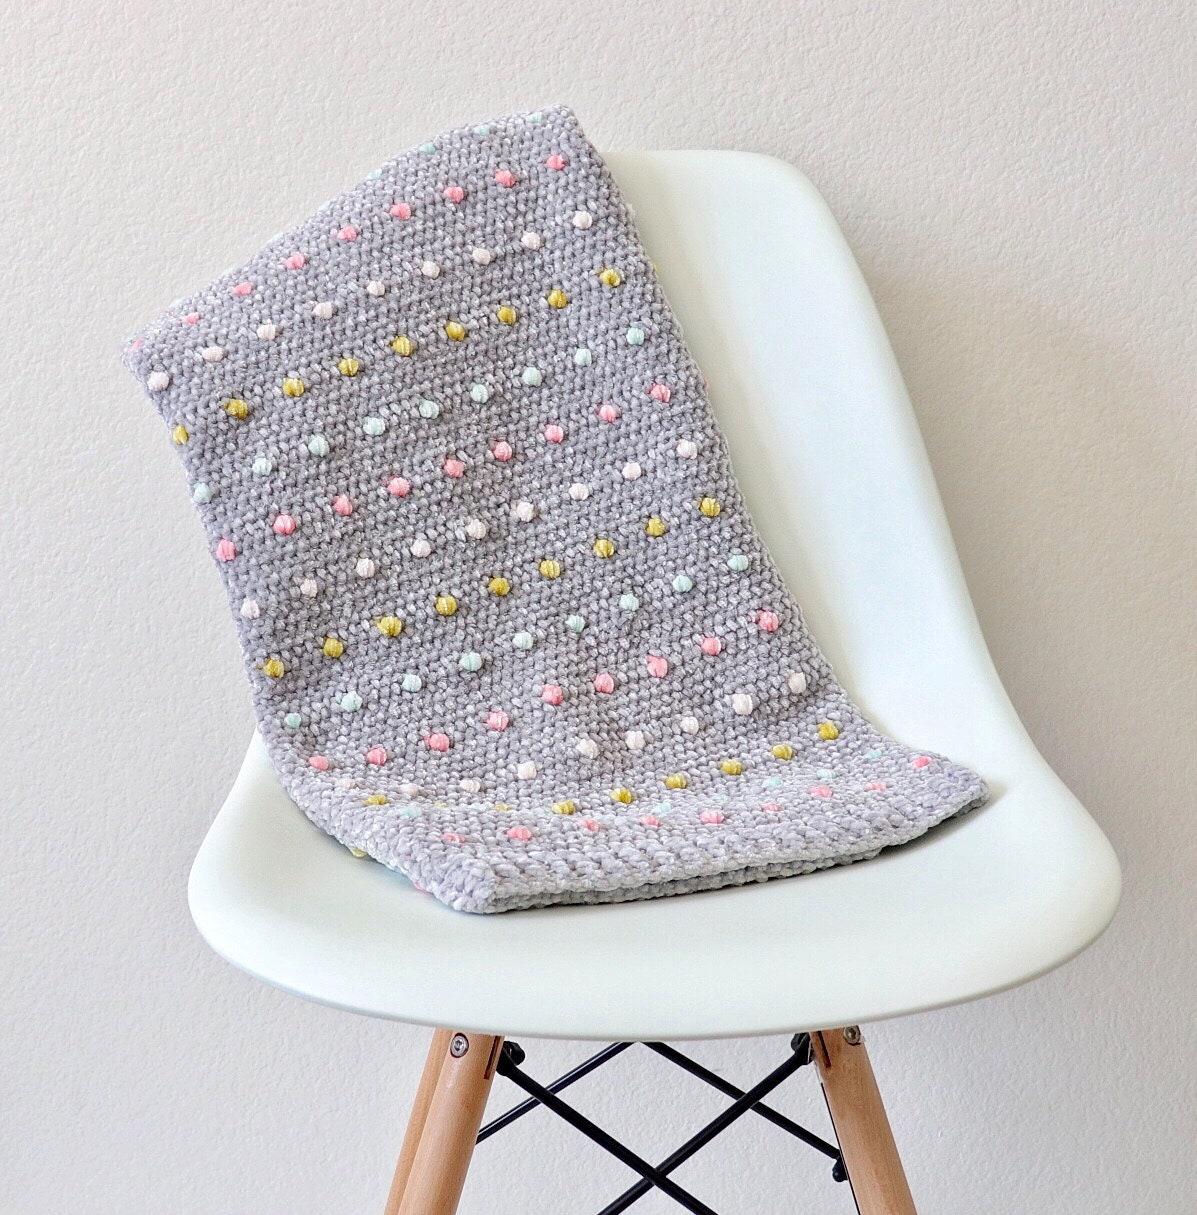 Crochet Candy Dots Baby Blanket Pattern